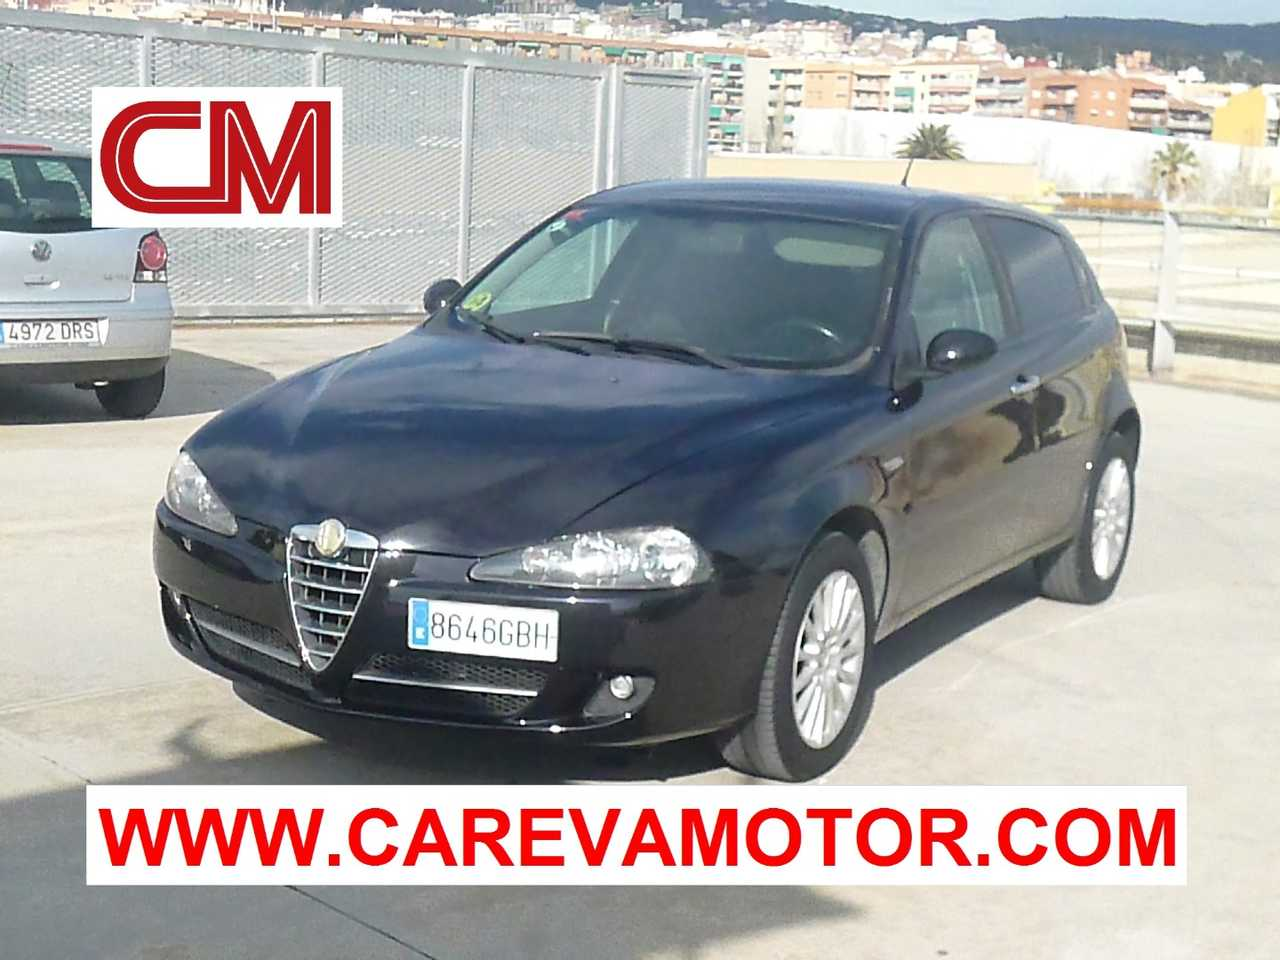 Alfa Romeo 147 1.9 JTD 120CV 5P   - Foto 1